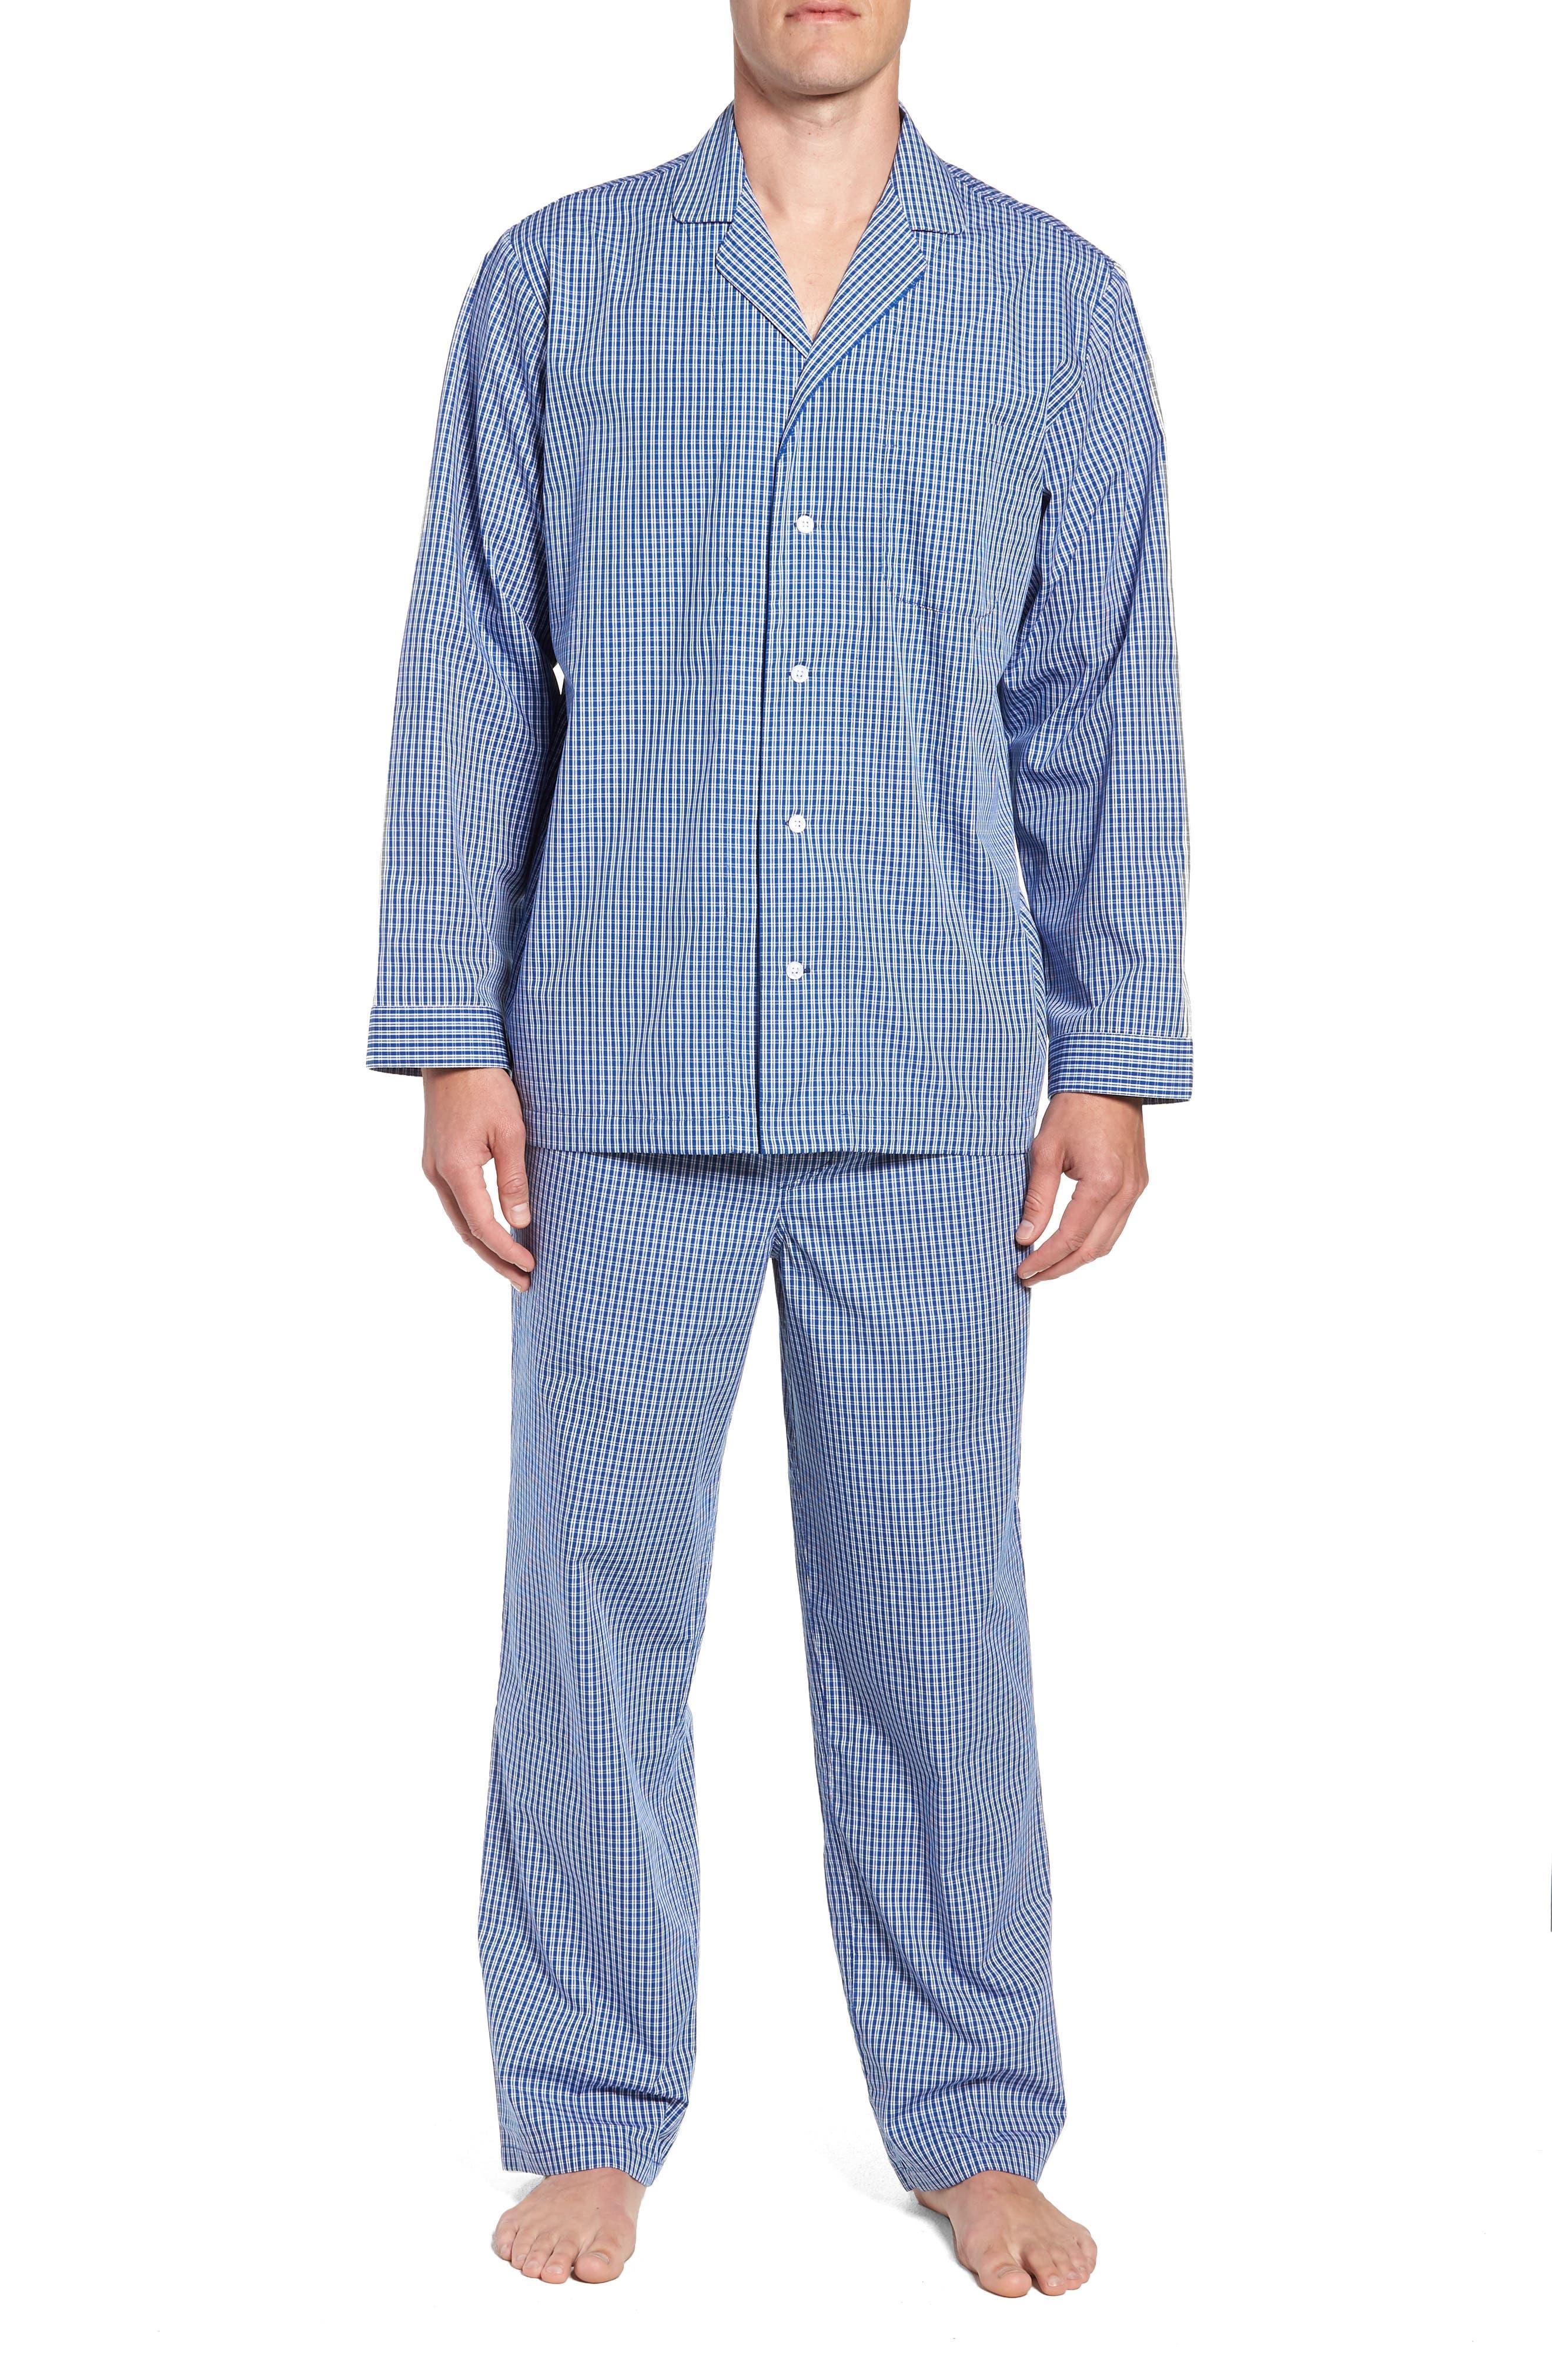 NORDSTROM MEN'S SHOP, Poplin Pajama Set, Main thumbnail 1, color, 404